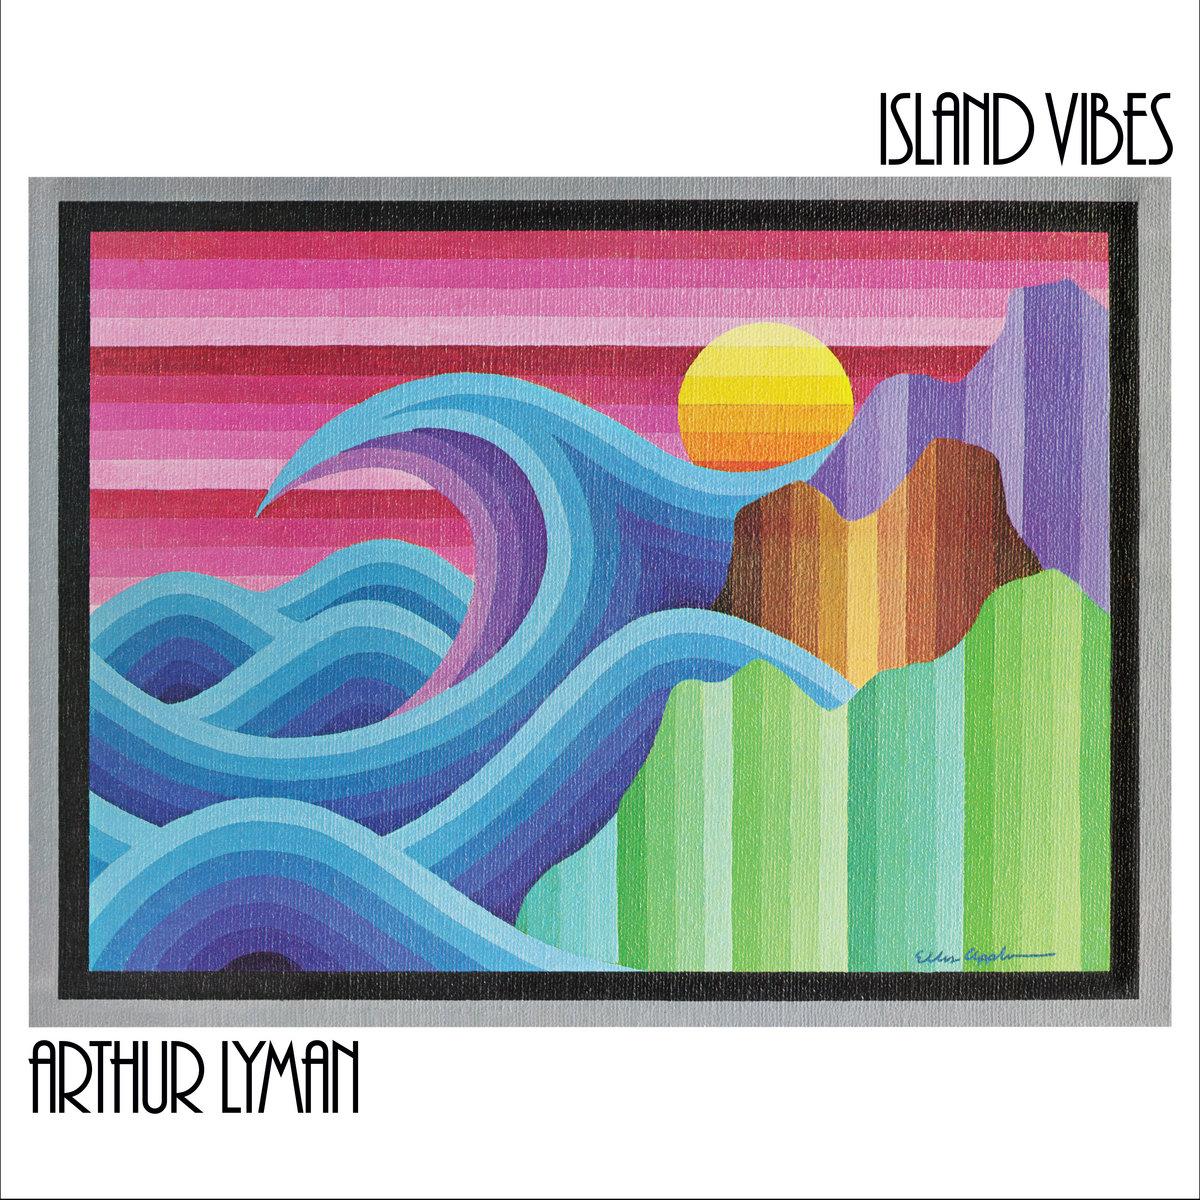 Arthur Lyman : Island Vibes